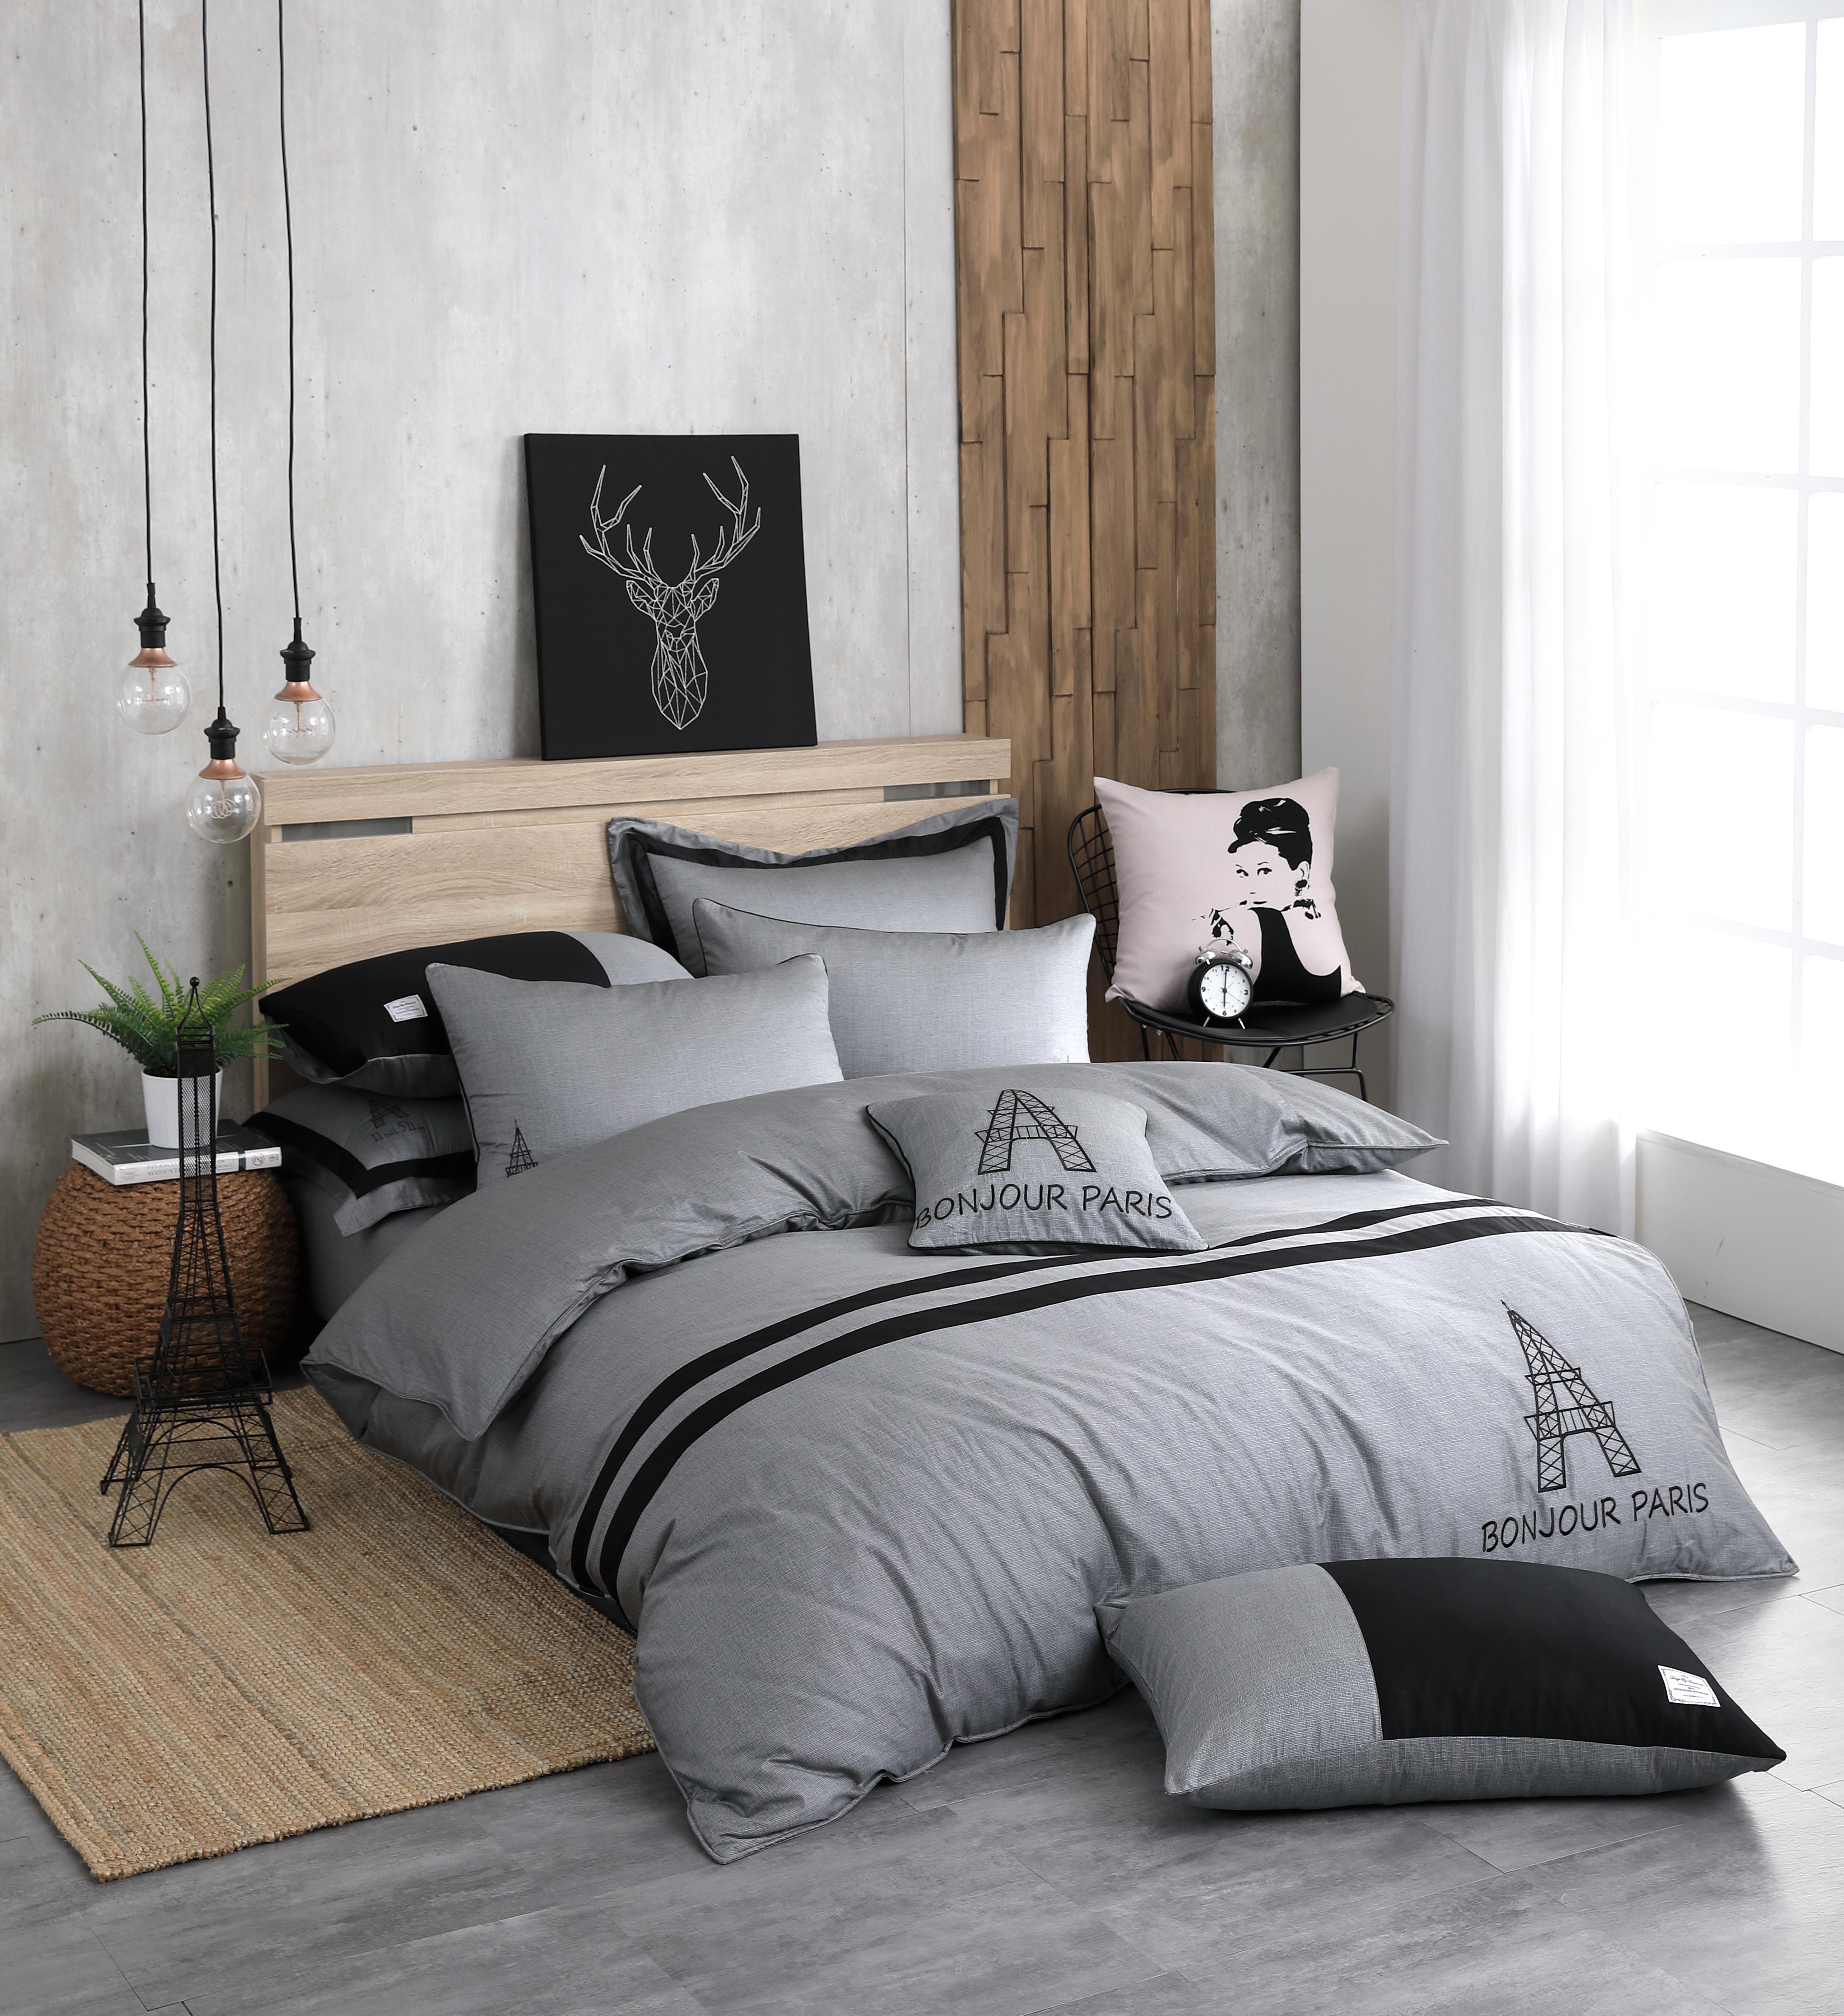 OLIVIA 《 奧斯汀 深灰 》 雙人兩用被套床包四件組  設計師工業風格 MIT原創設計寢具